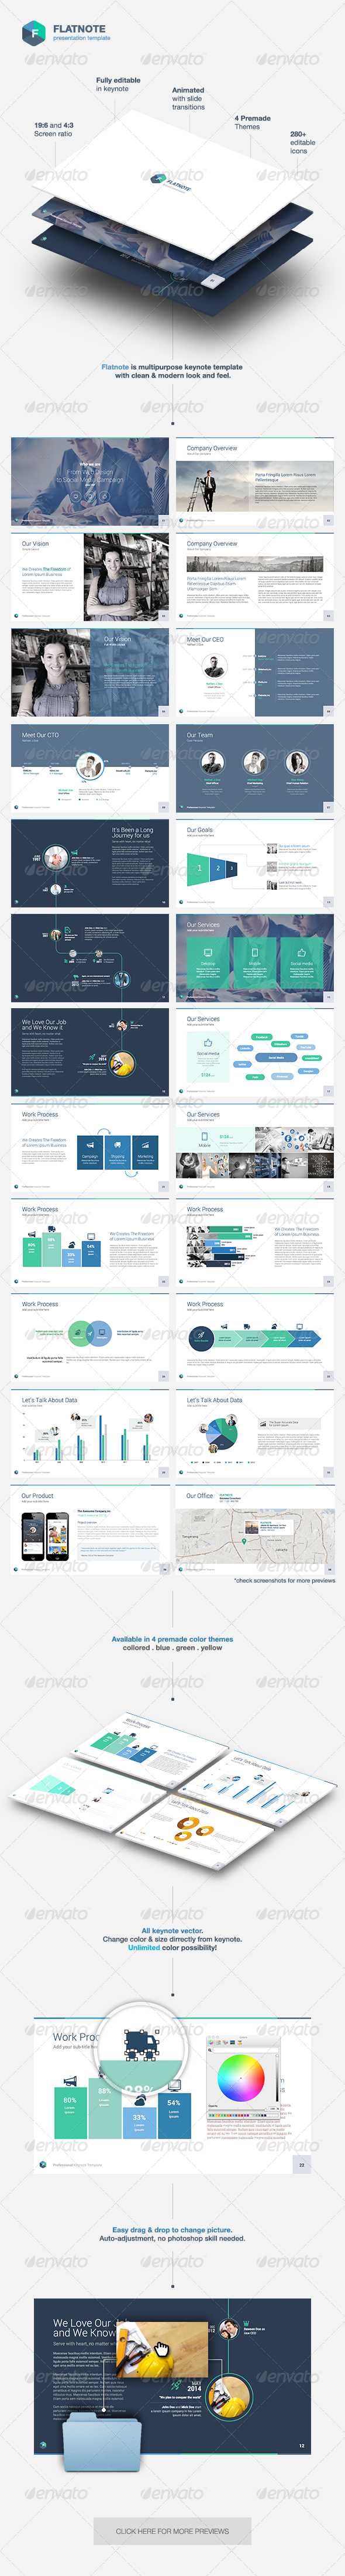 Flatnote - Business Keynote Template - Keynote Templates Presentation Templates